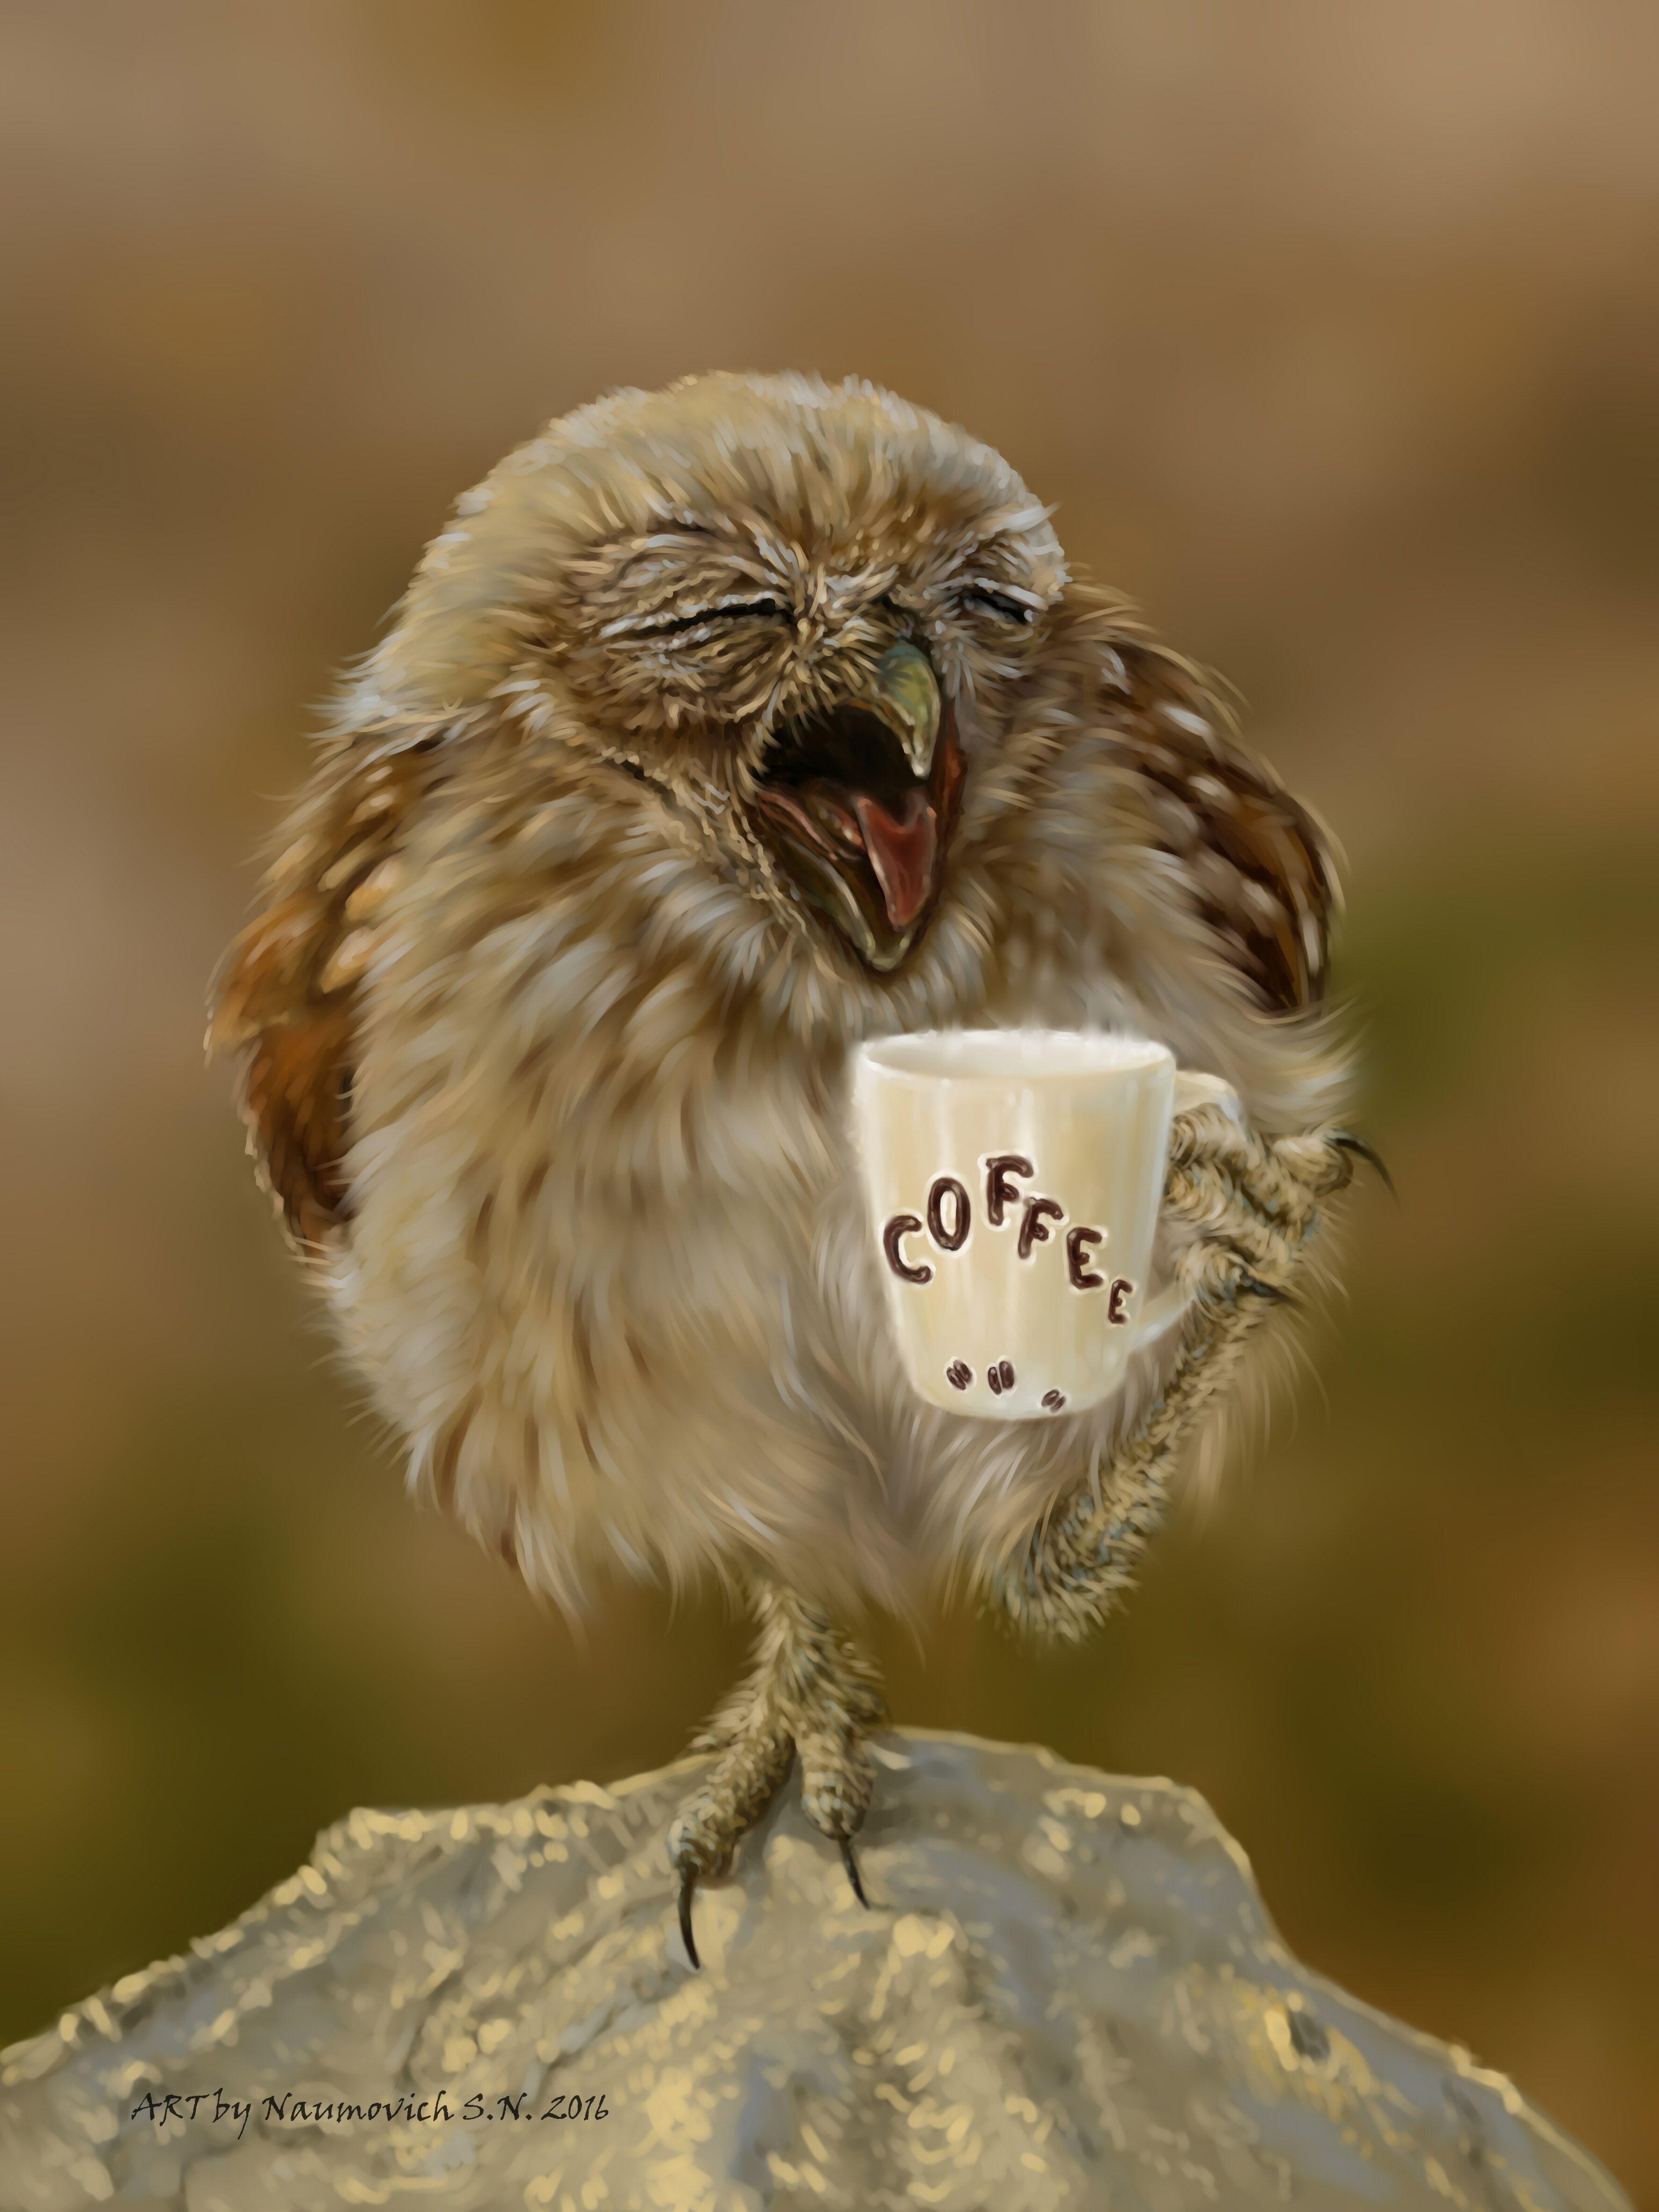 Фото с добрым утром сова